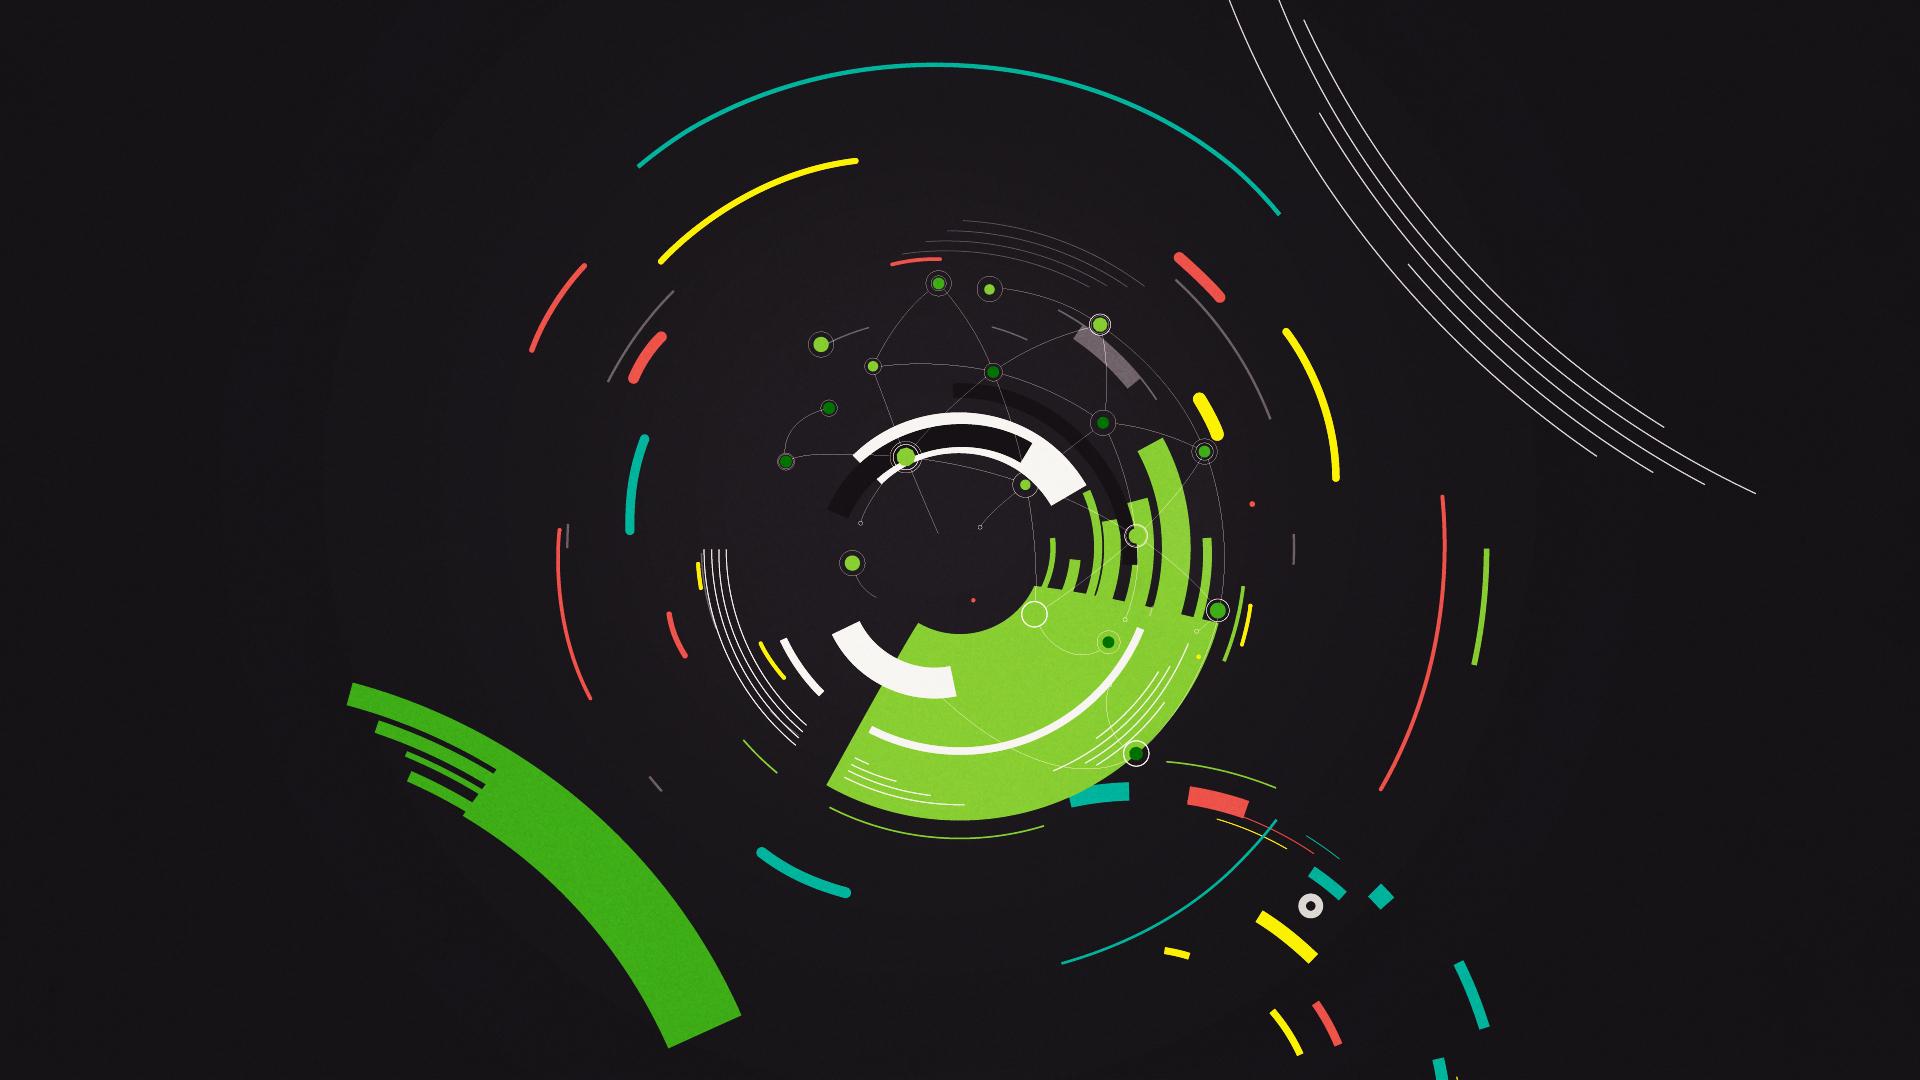 Buck - 2013 - Xbox Pitch Frame 13.jpg